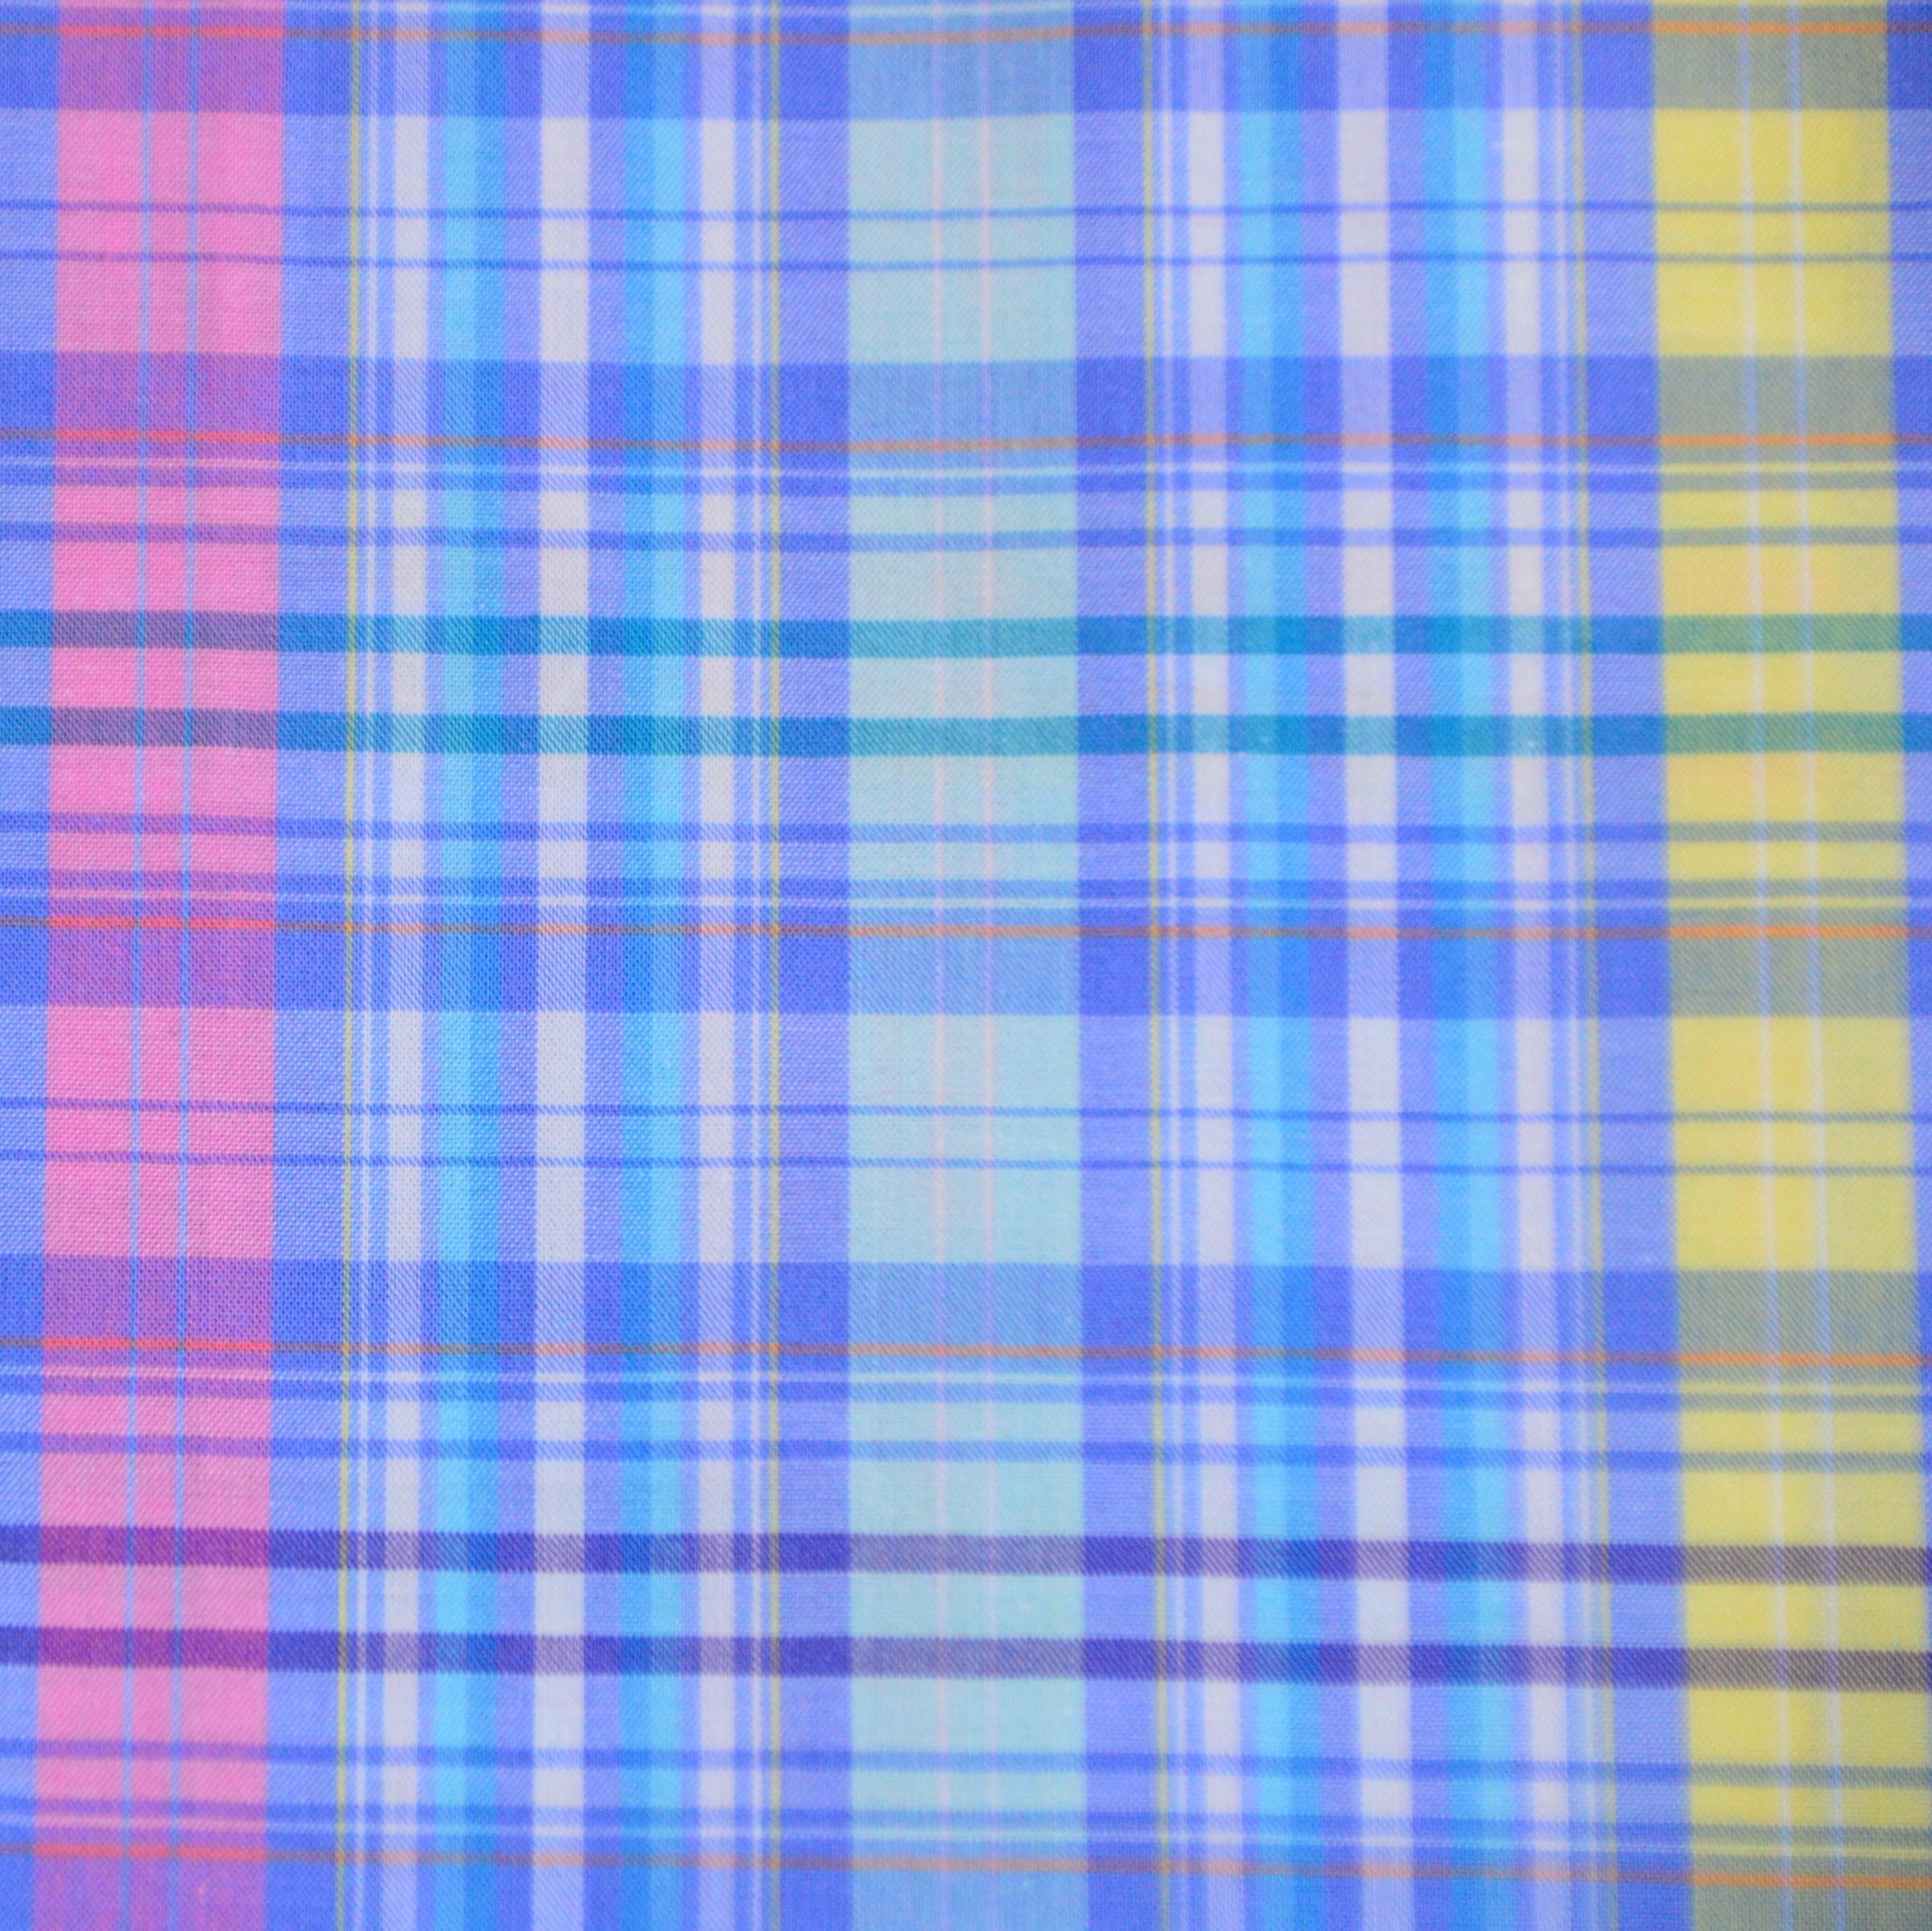 110 cuadros tonos azules amarillos rosas